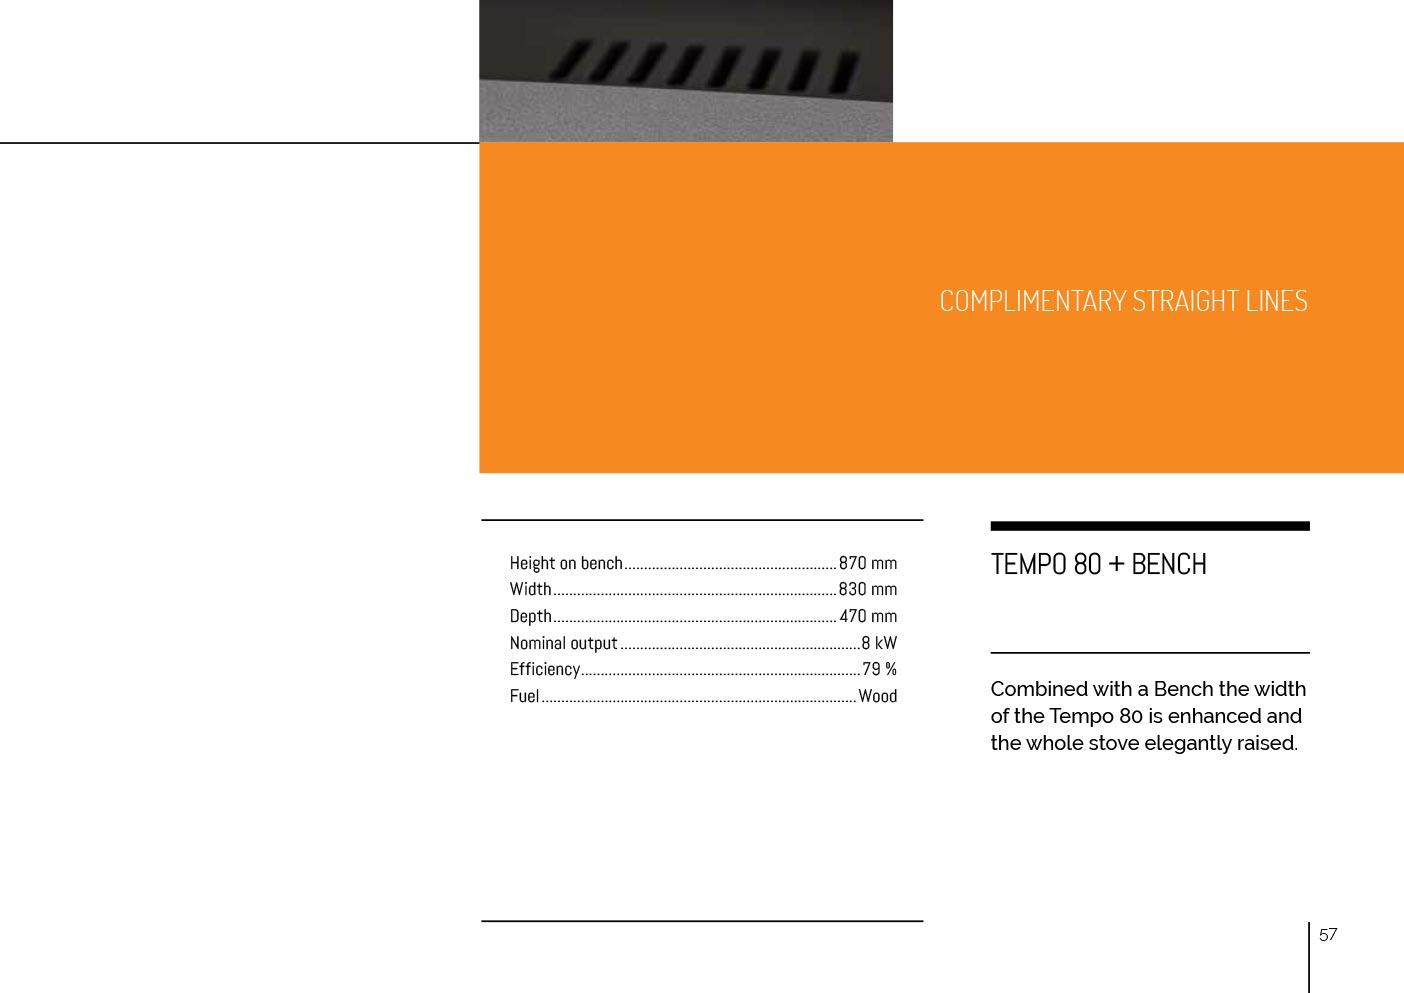 opus-stoves-brochure-(2)-57